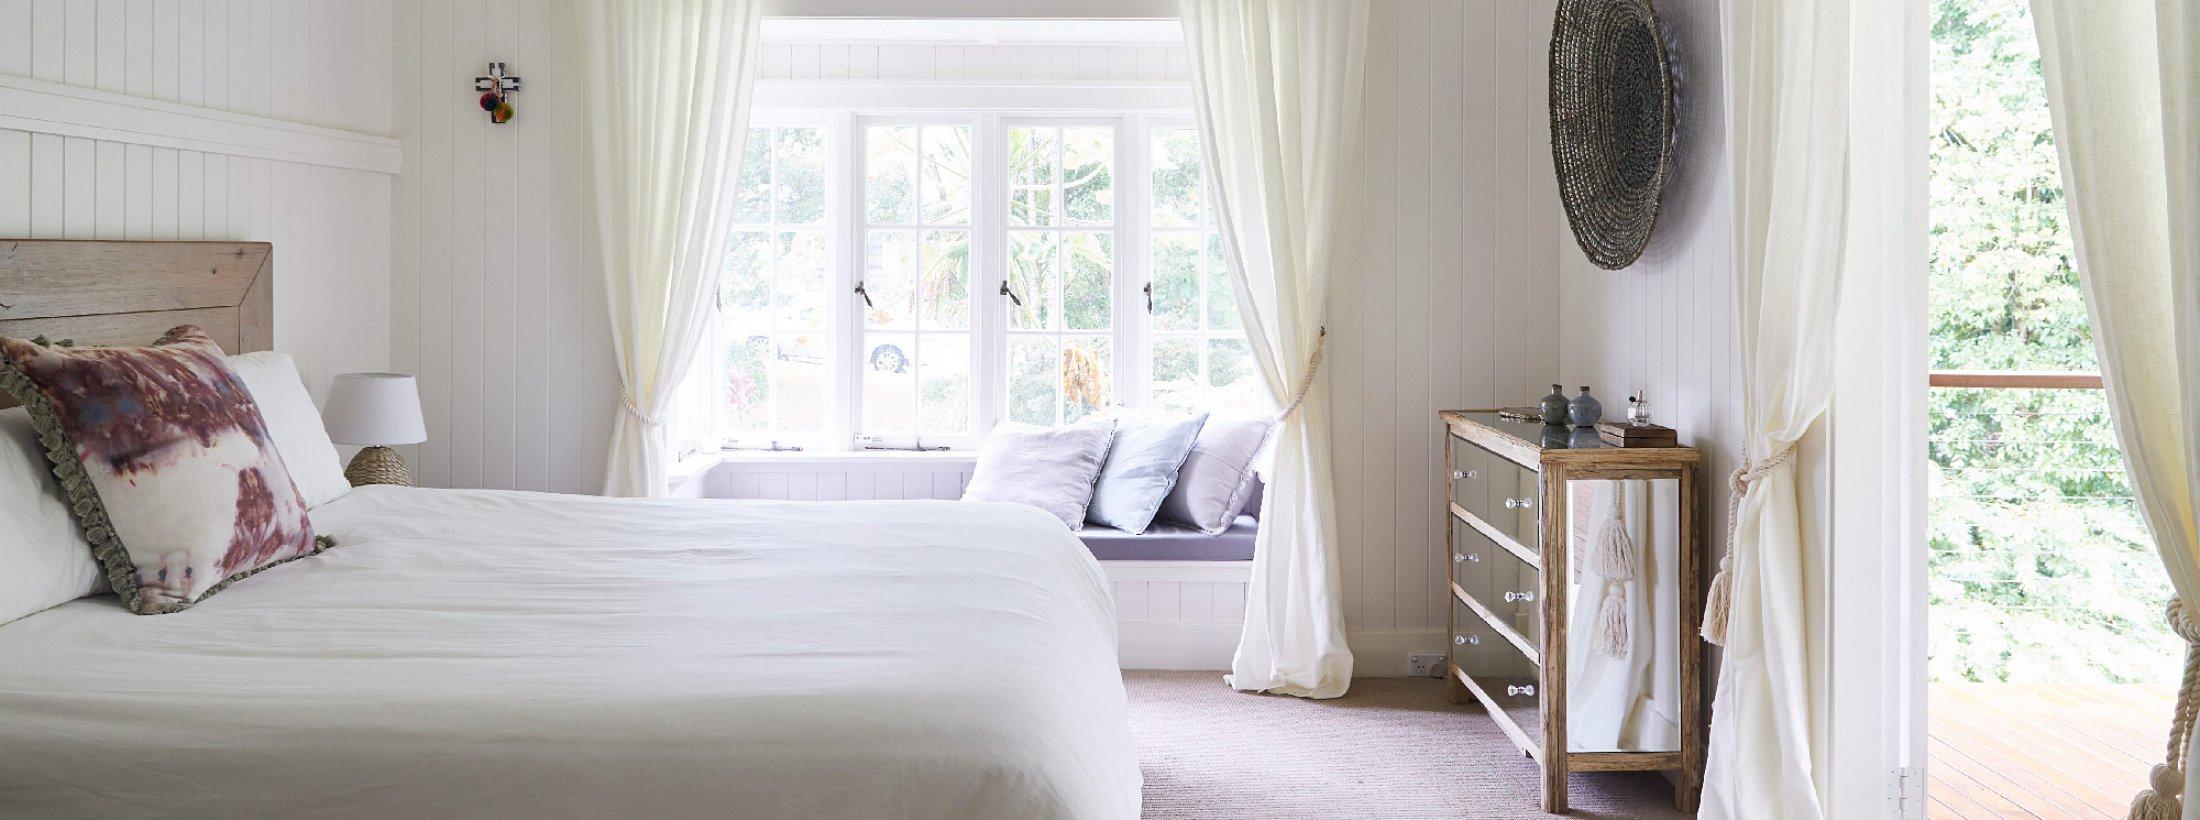 Mahalo House - Byron Bay - Master Bedroom a